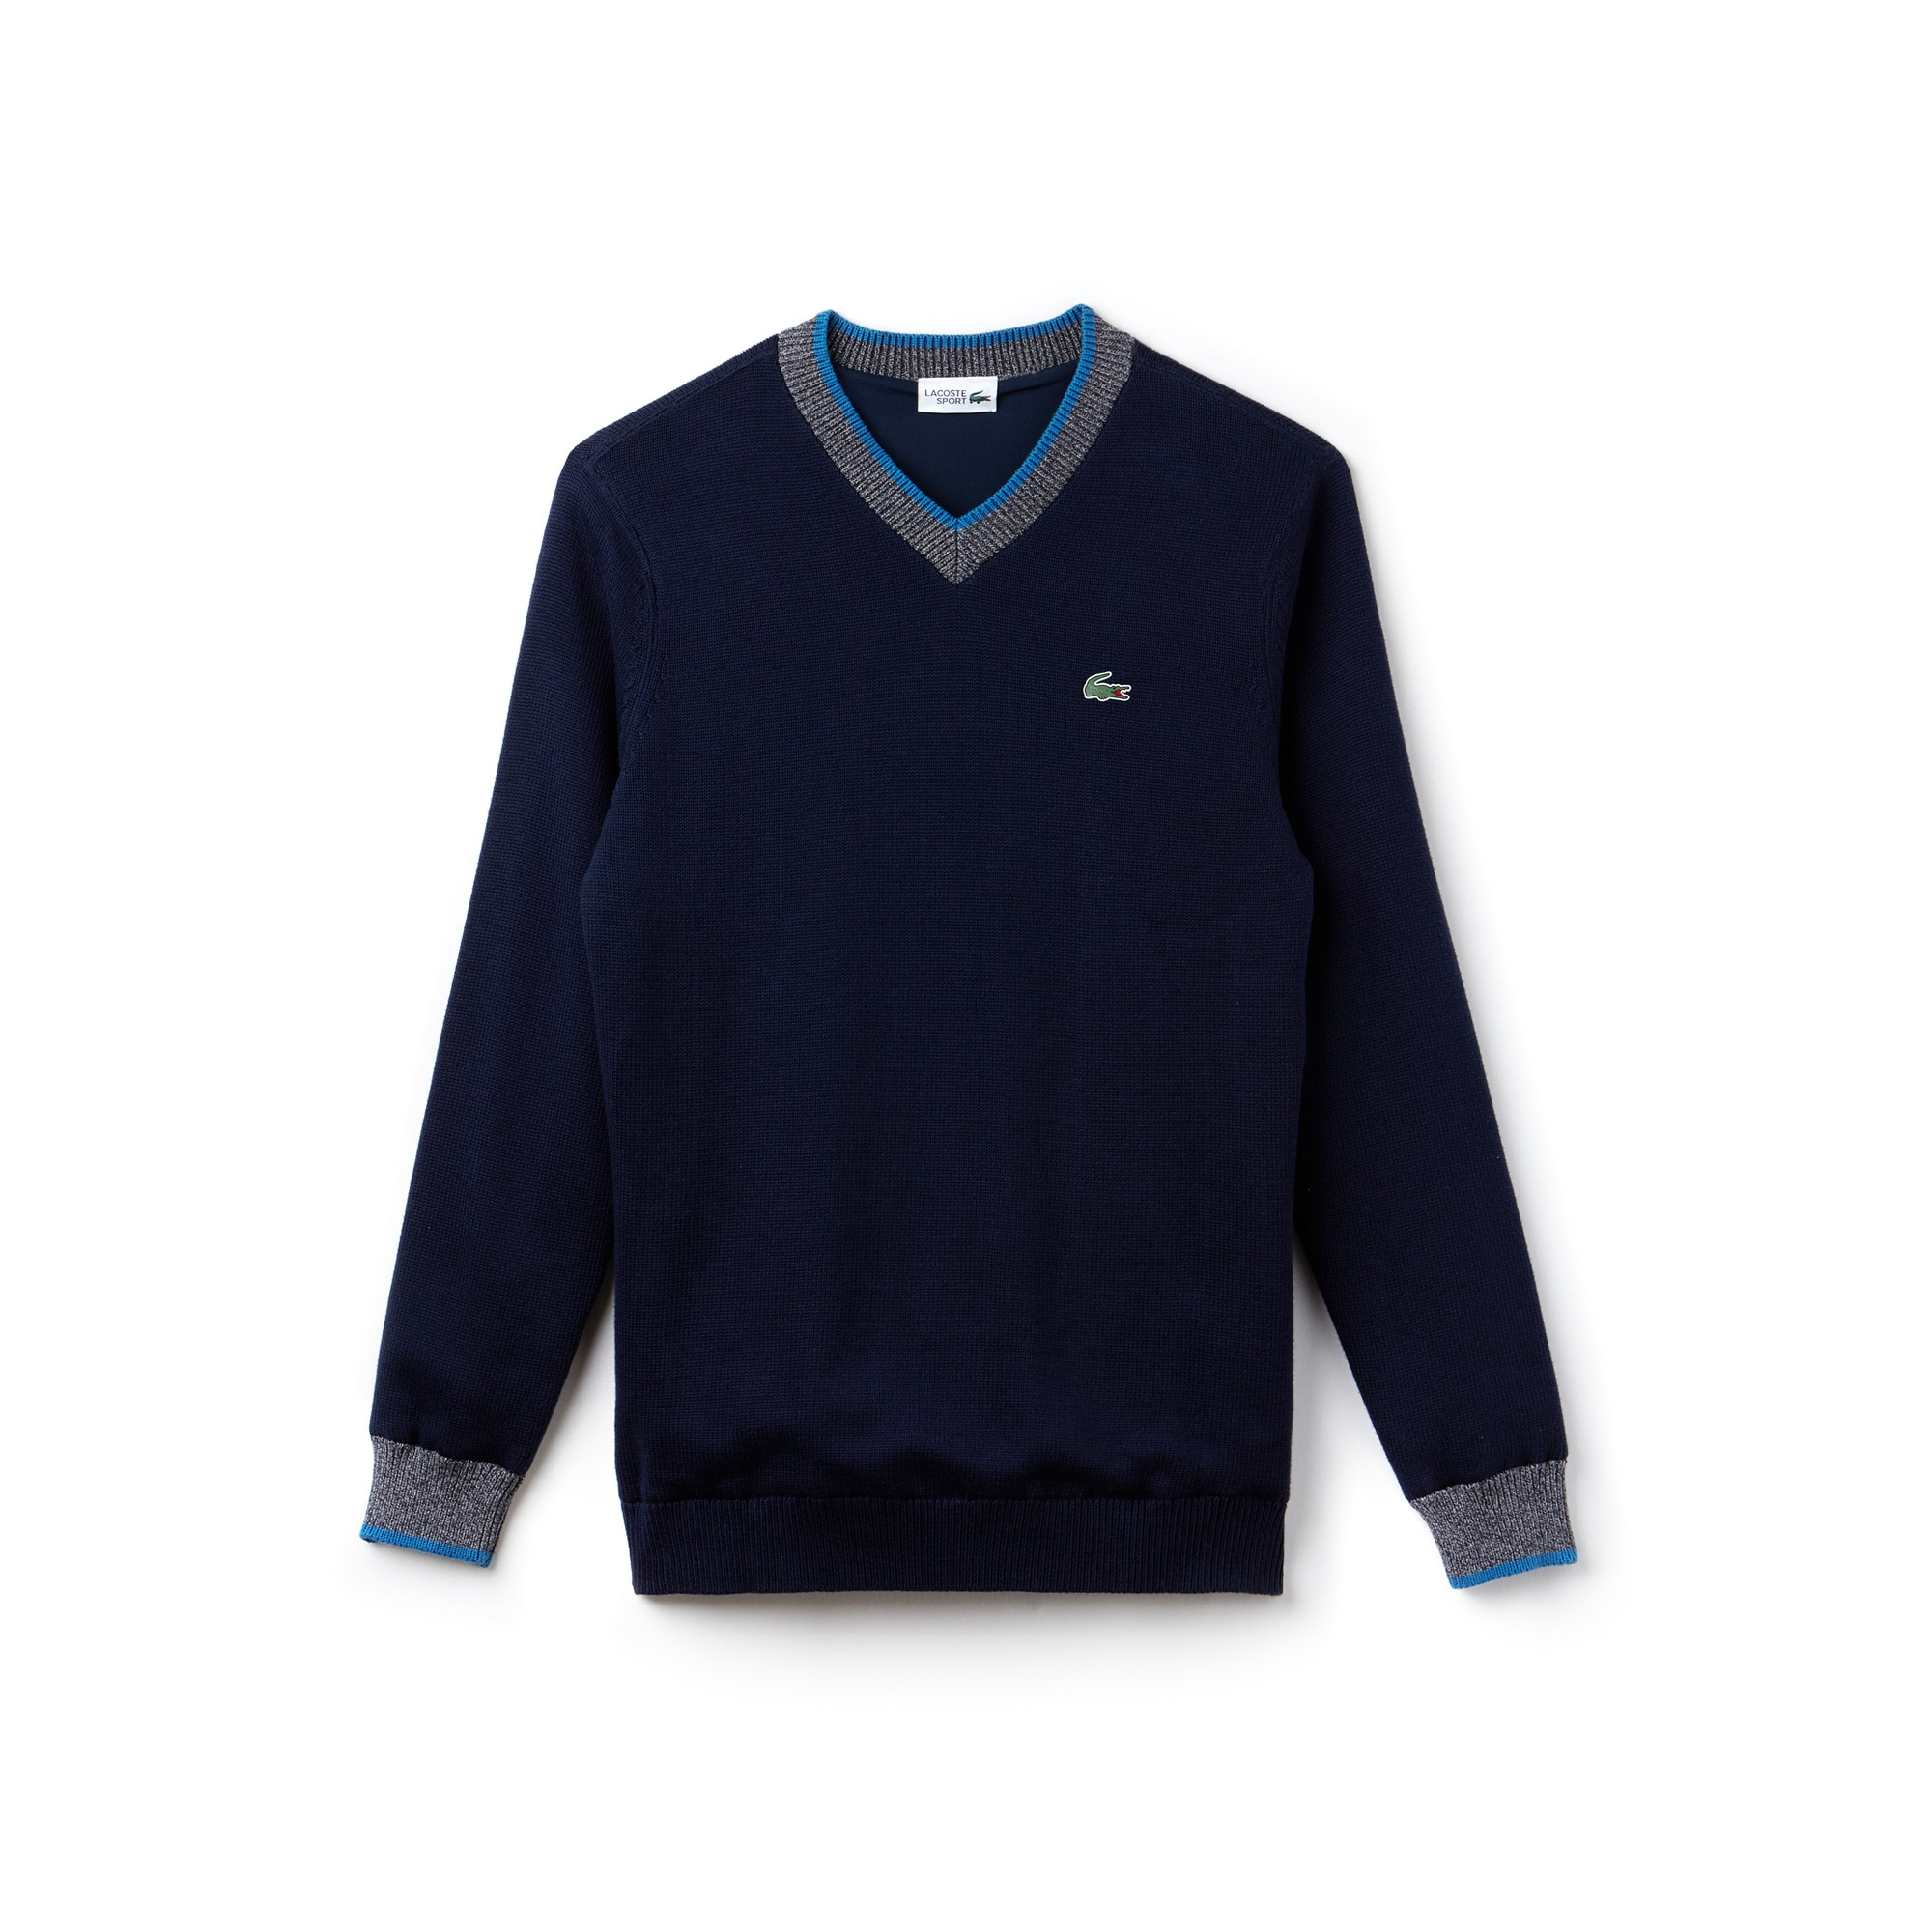 Men's Lacoste SPORT V-neck Technical Cotton Knit Golf Sweater